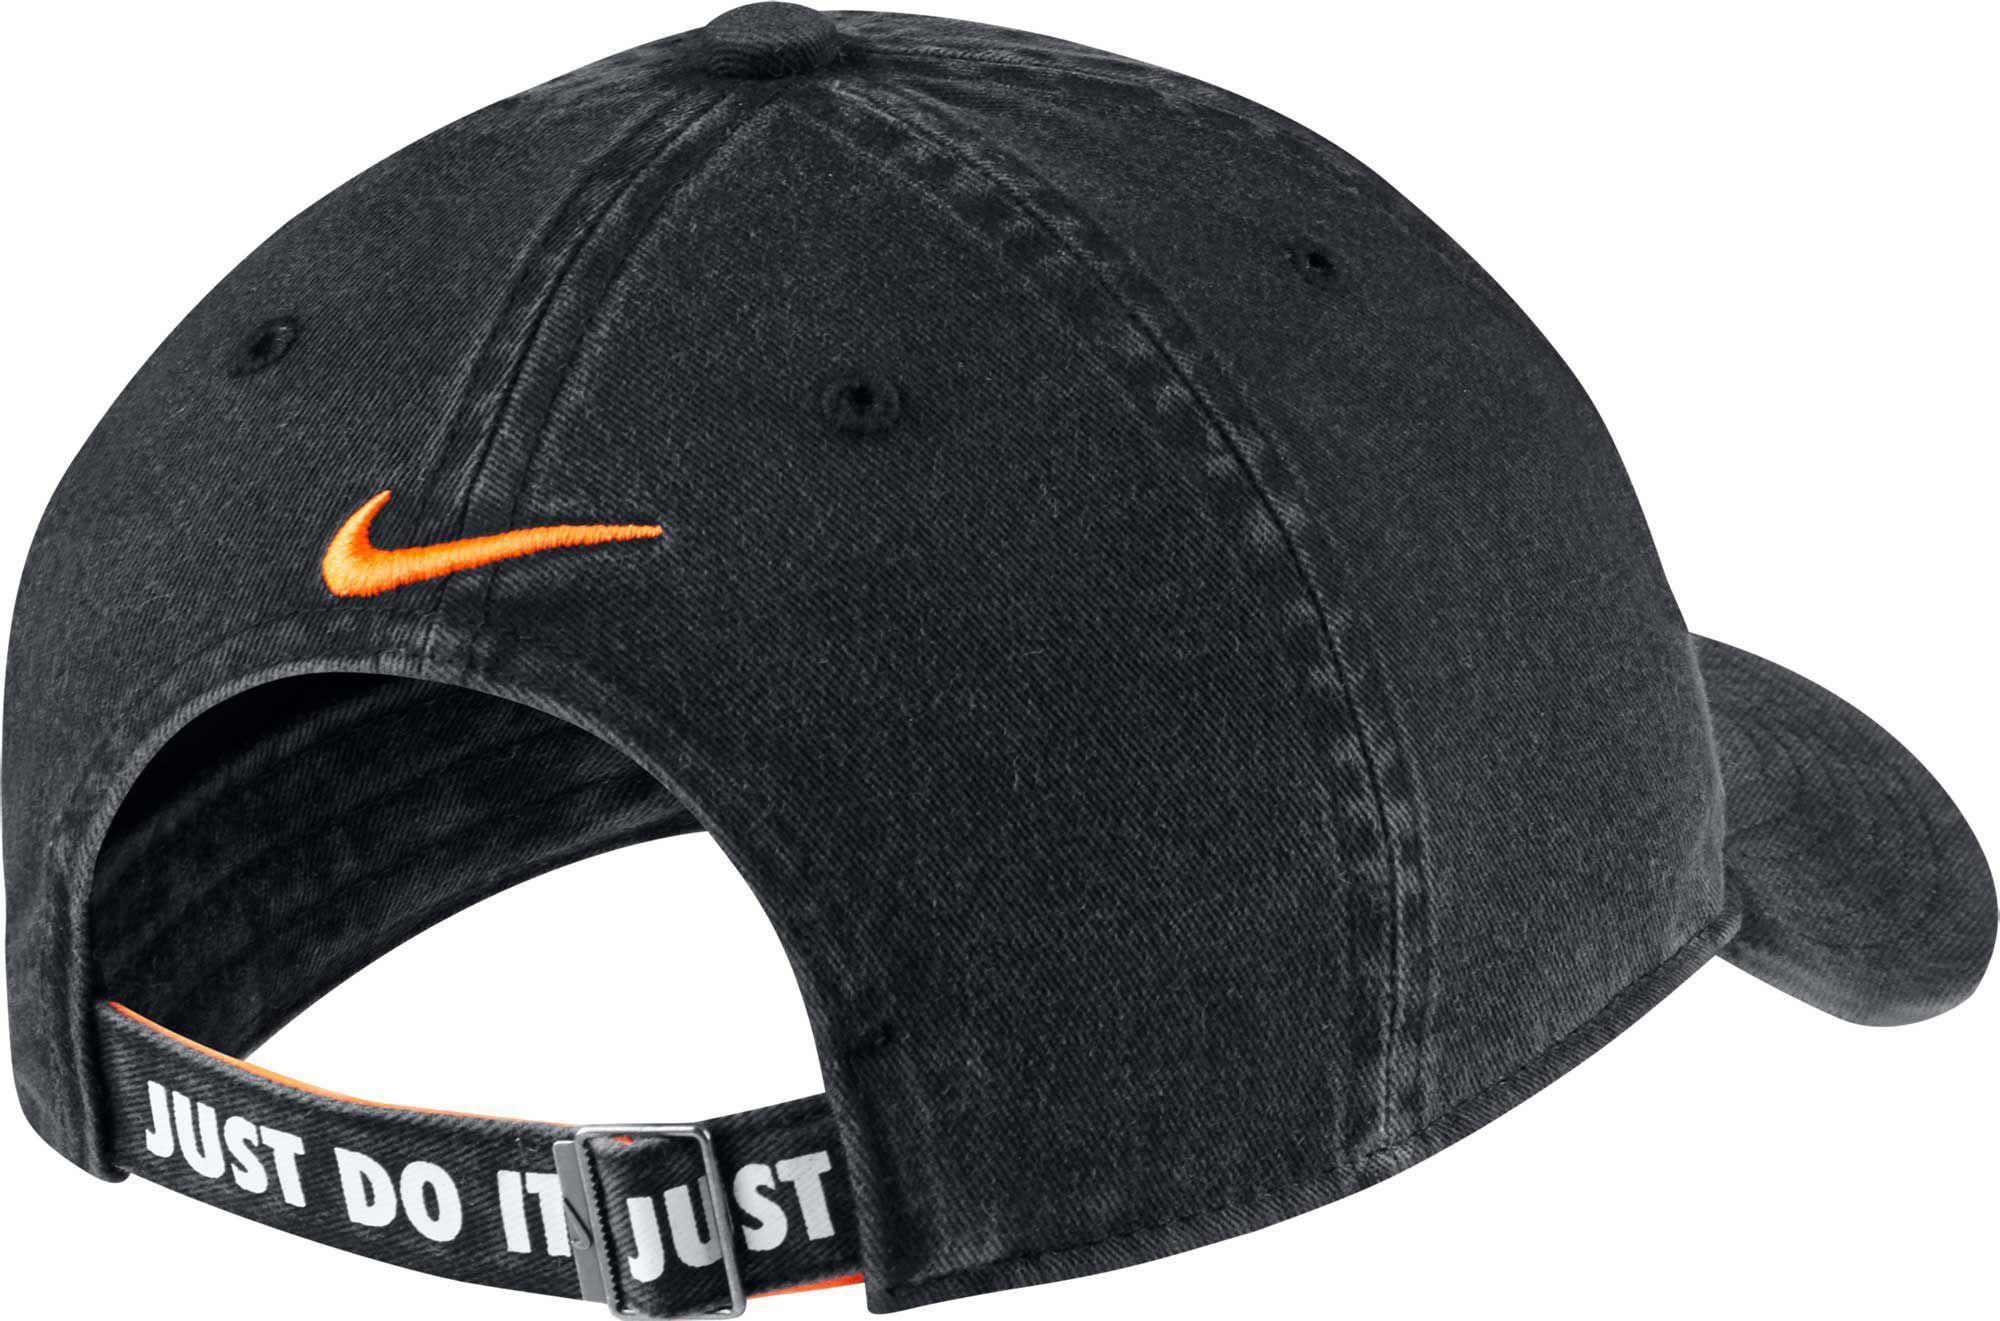 f856c0f5 Nike - Black Oys' Heritage86 Shoebox Adjustable Hat for Men - Lyst. View  fullscreen